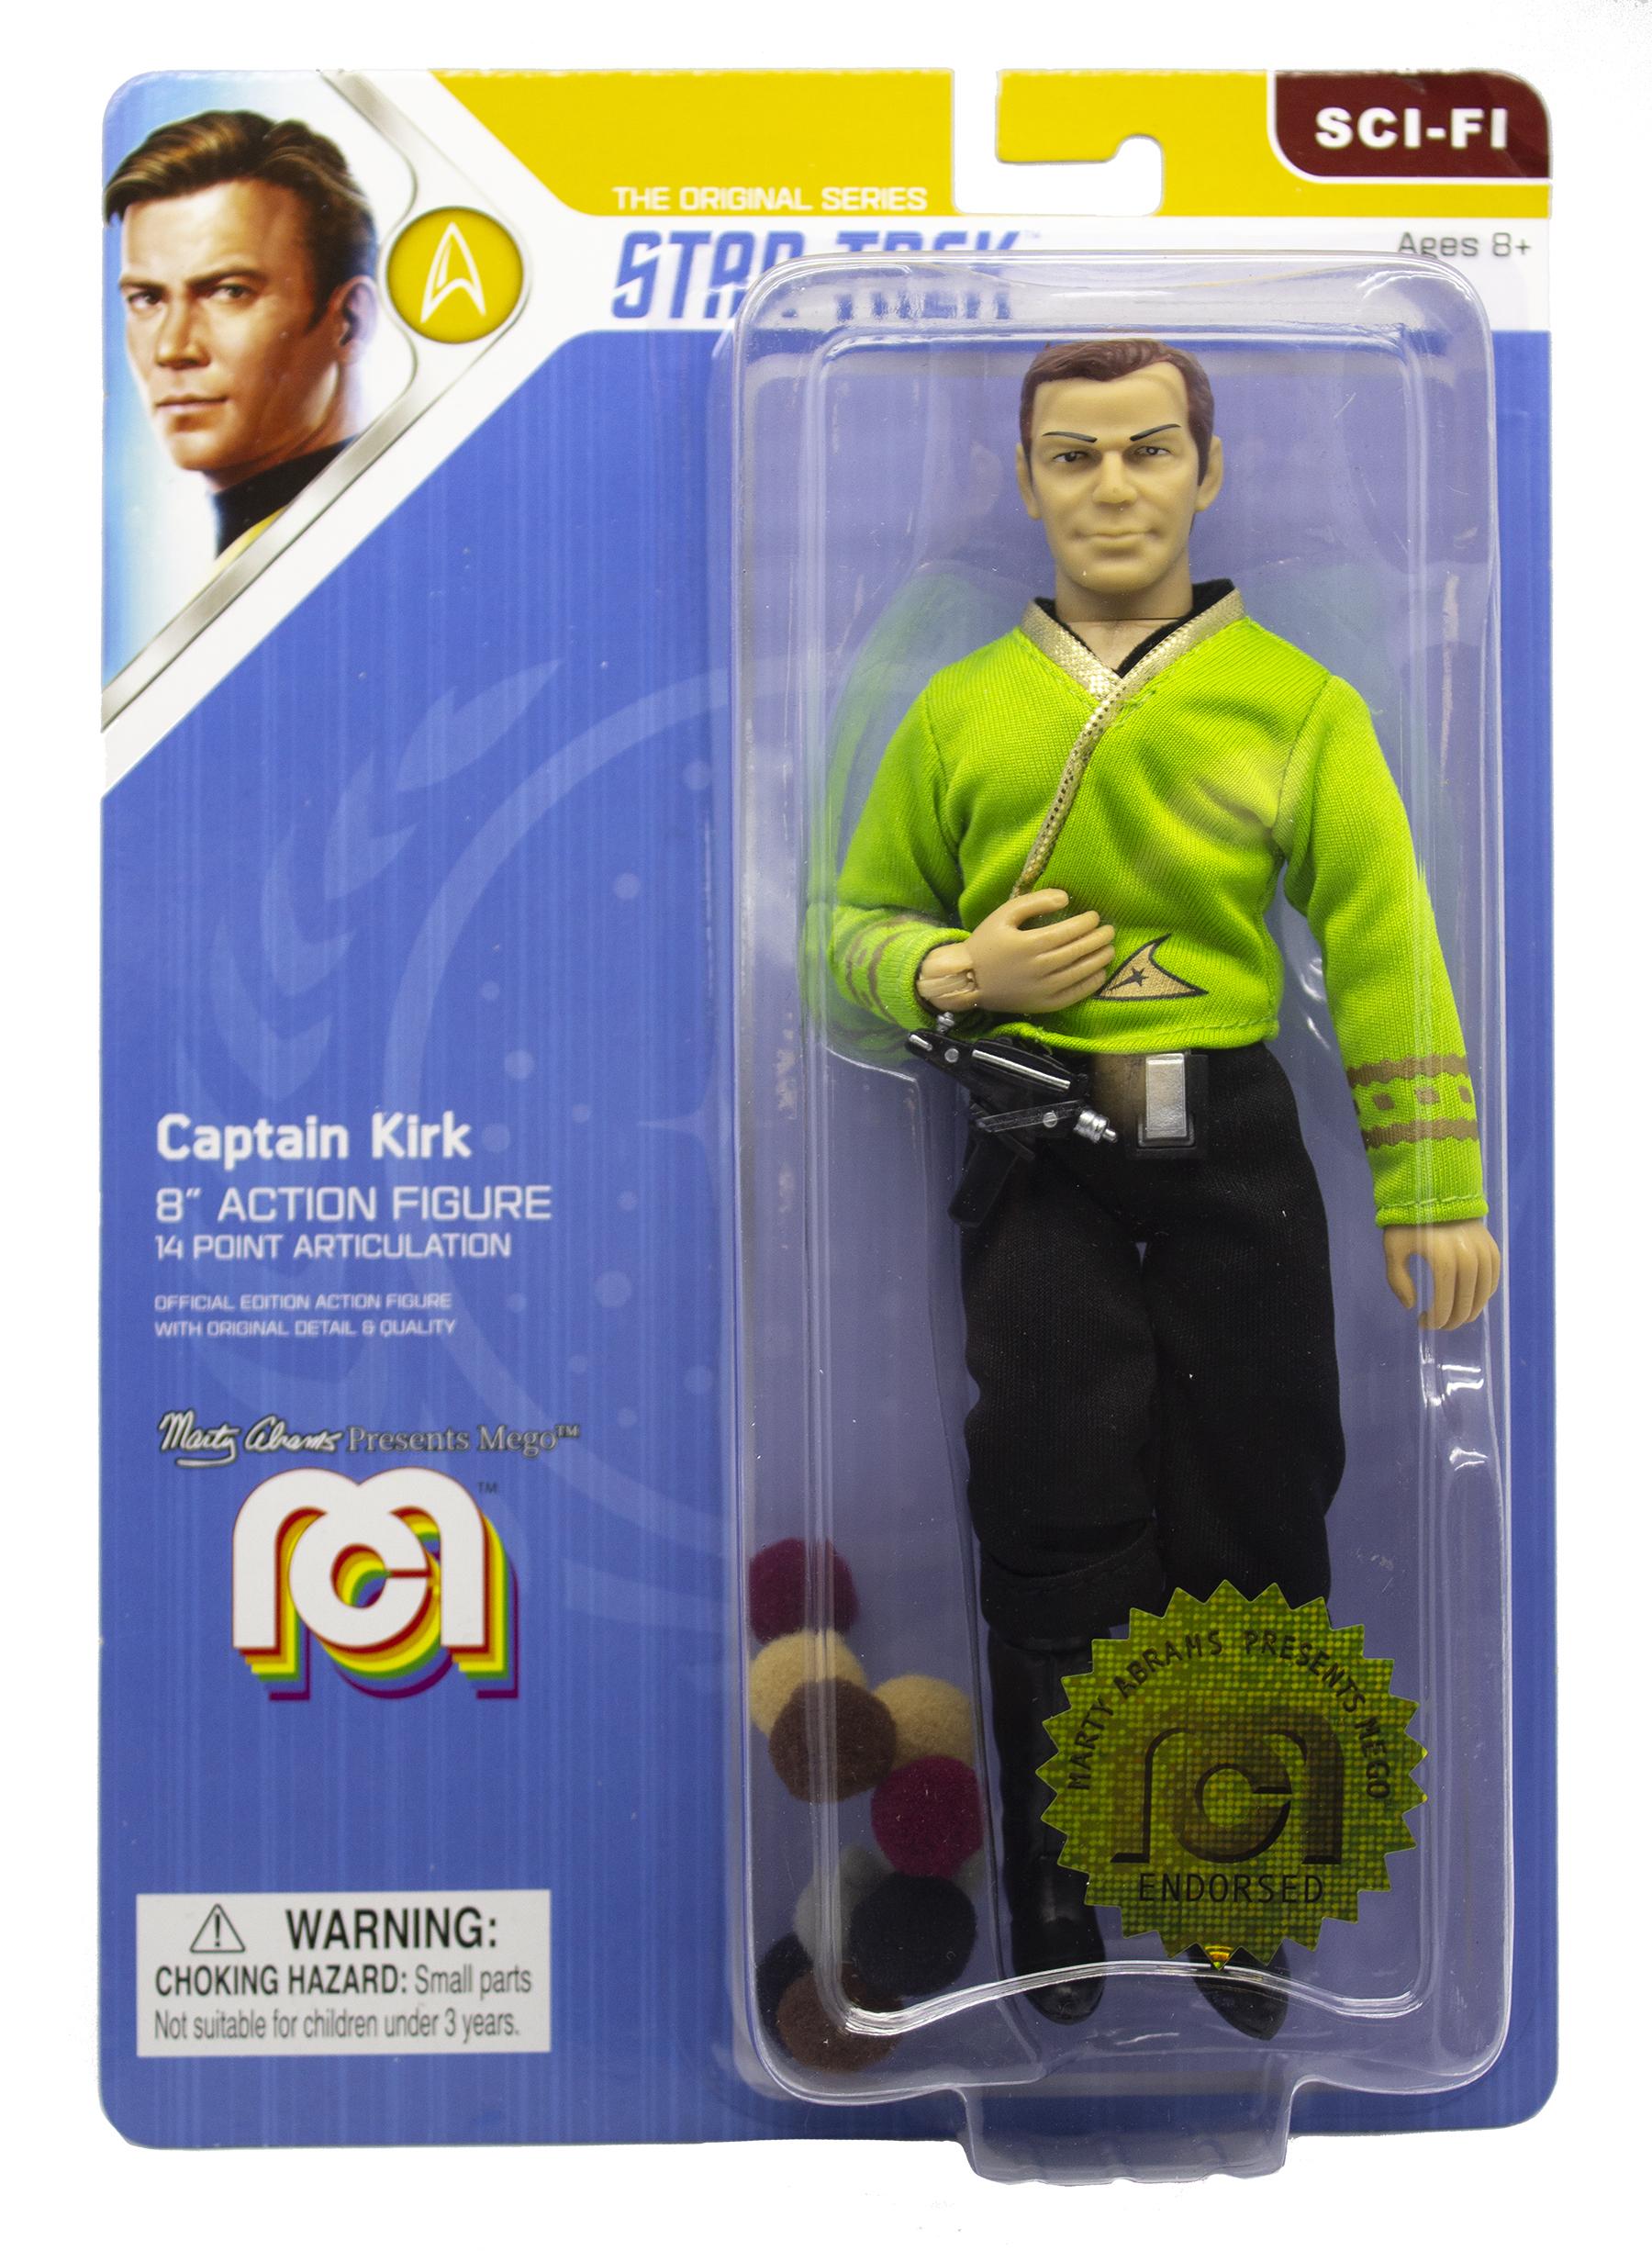 Mego Action Figures Romulan Commander Limited Edition Toys 8/&rdquo Star Trek